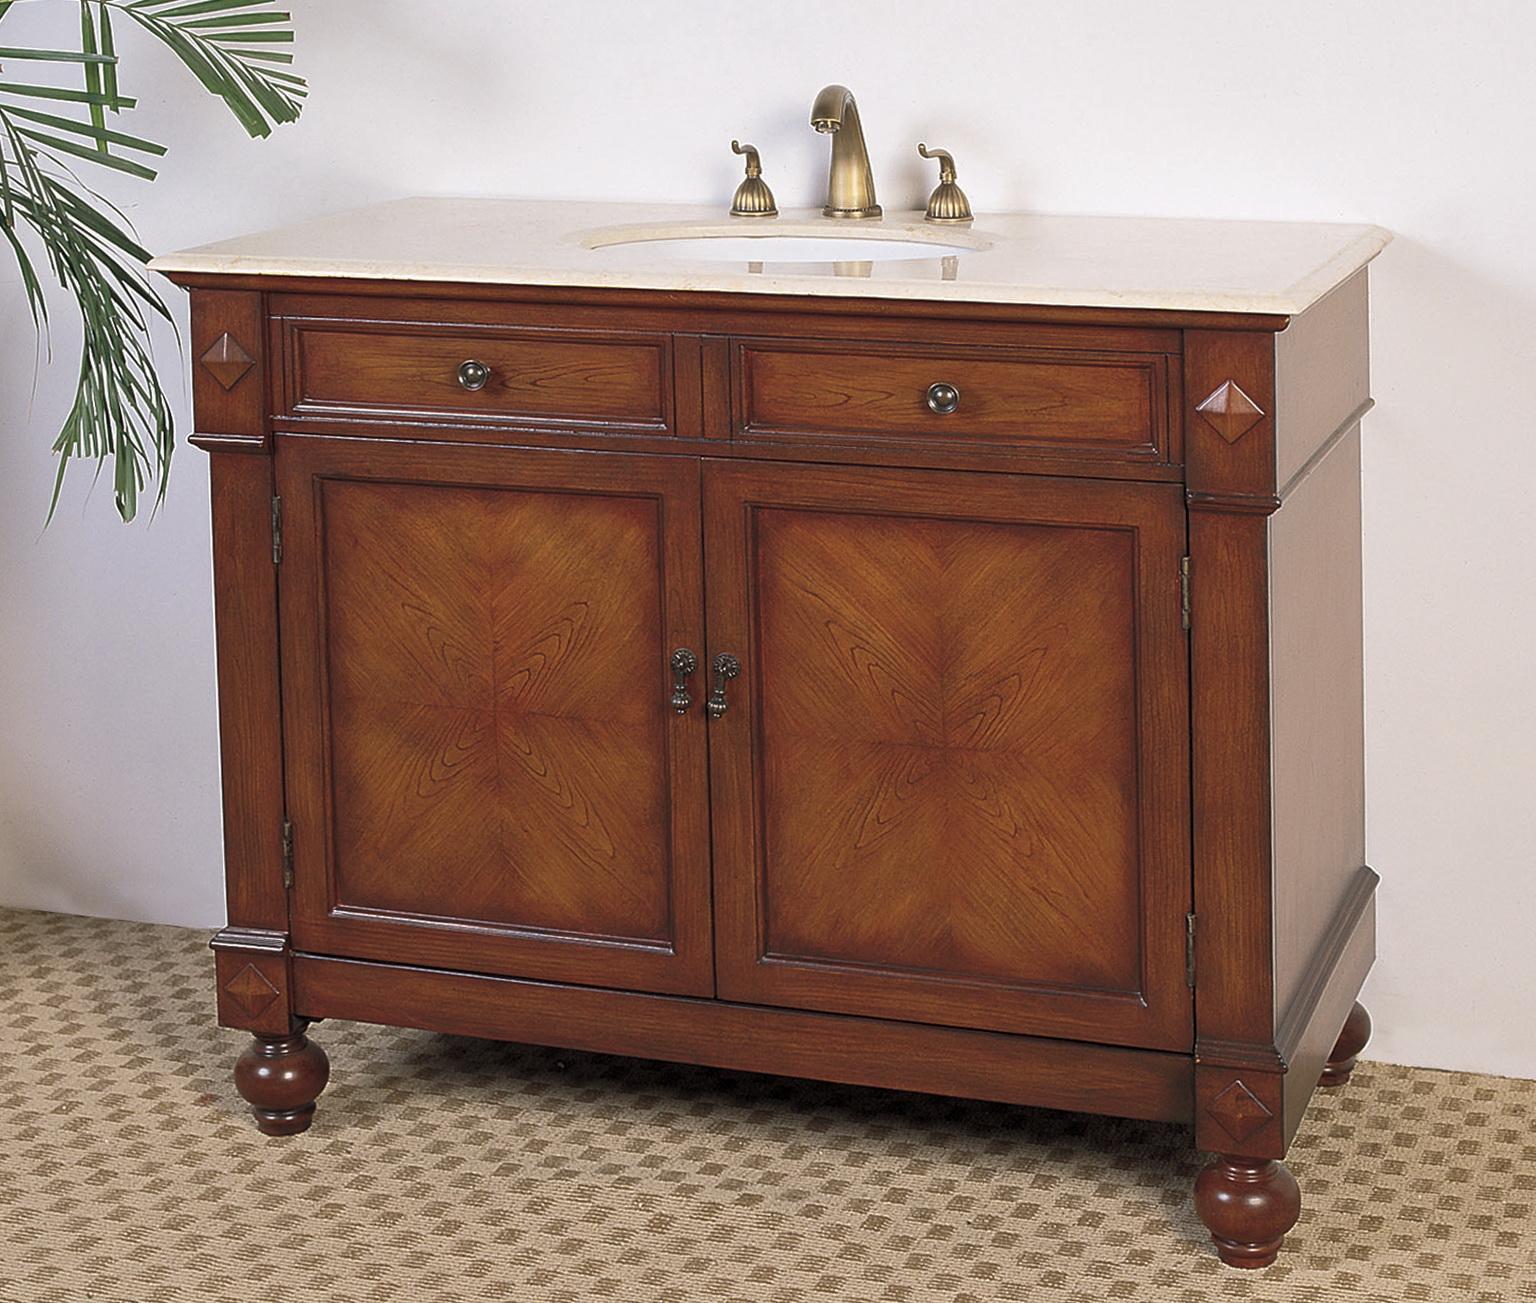 42 Inch Bathroom Vanity Base